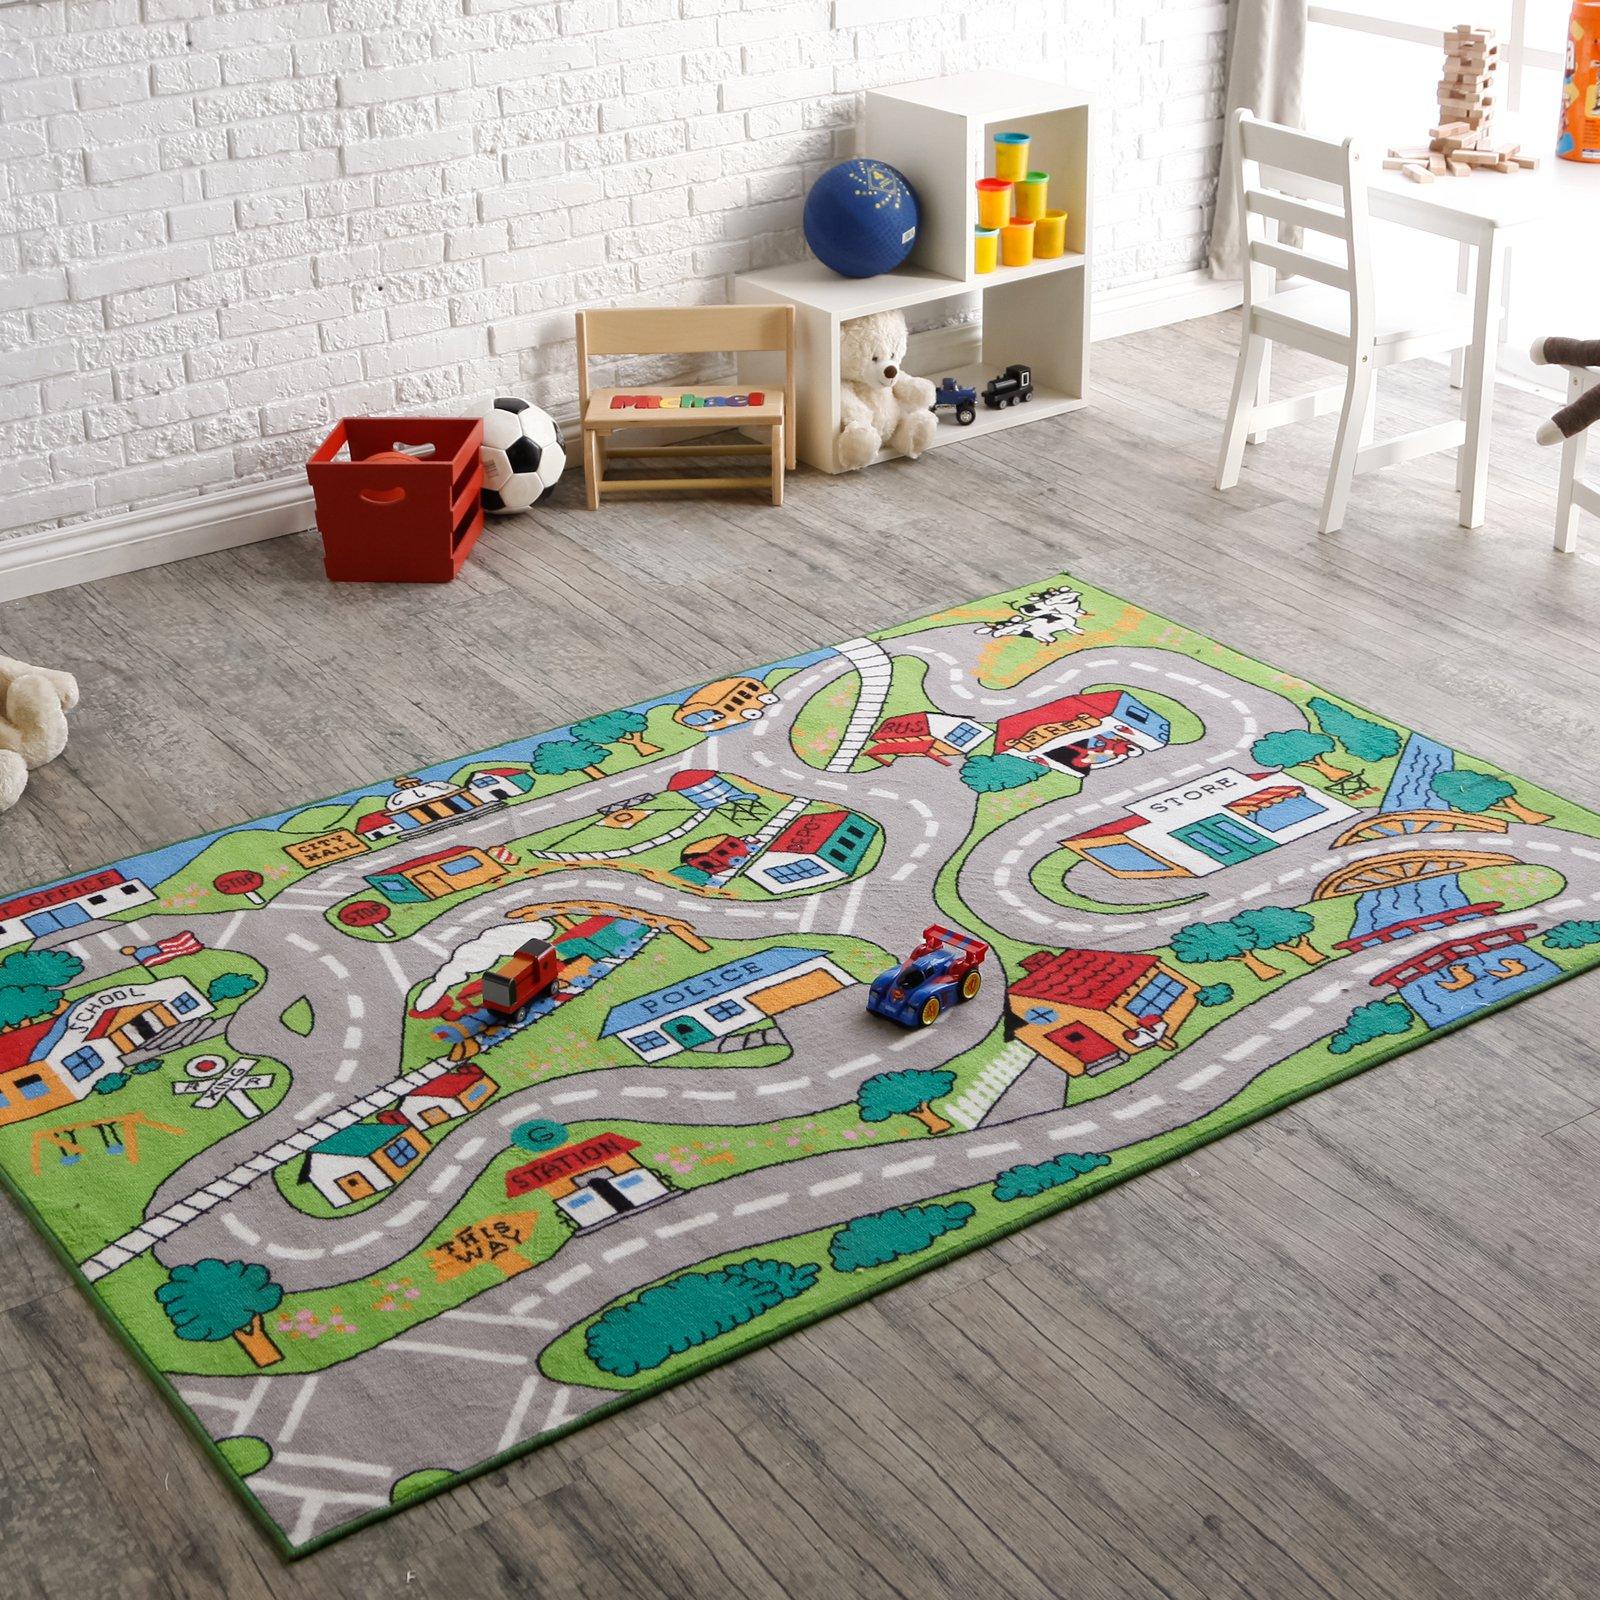 modern kid rugs compact kids rugs kids room decor:kid room rugs ways theme images stylish PISRPRL